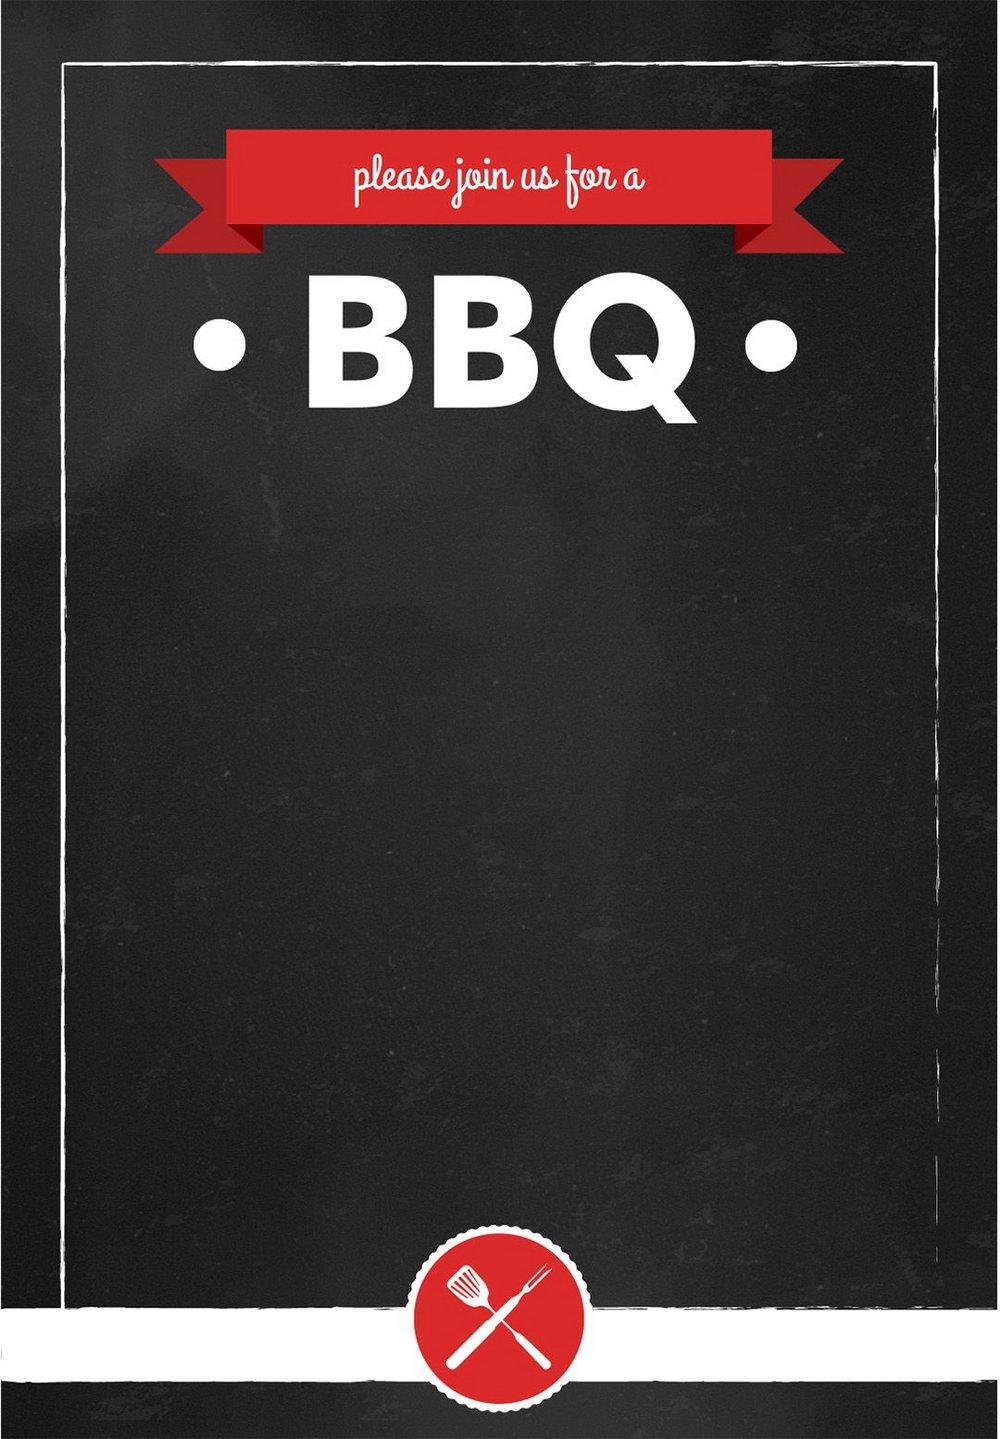 Summer Bbq Invitation Templates